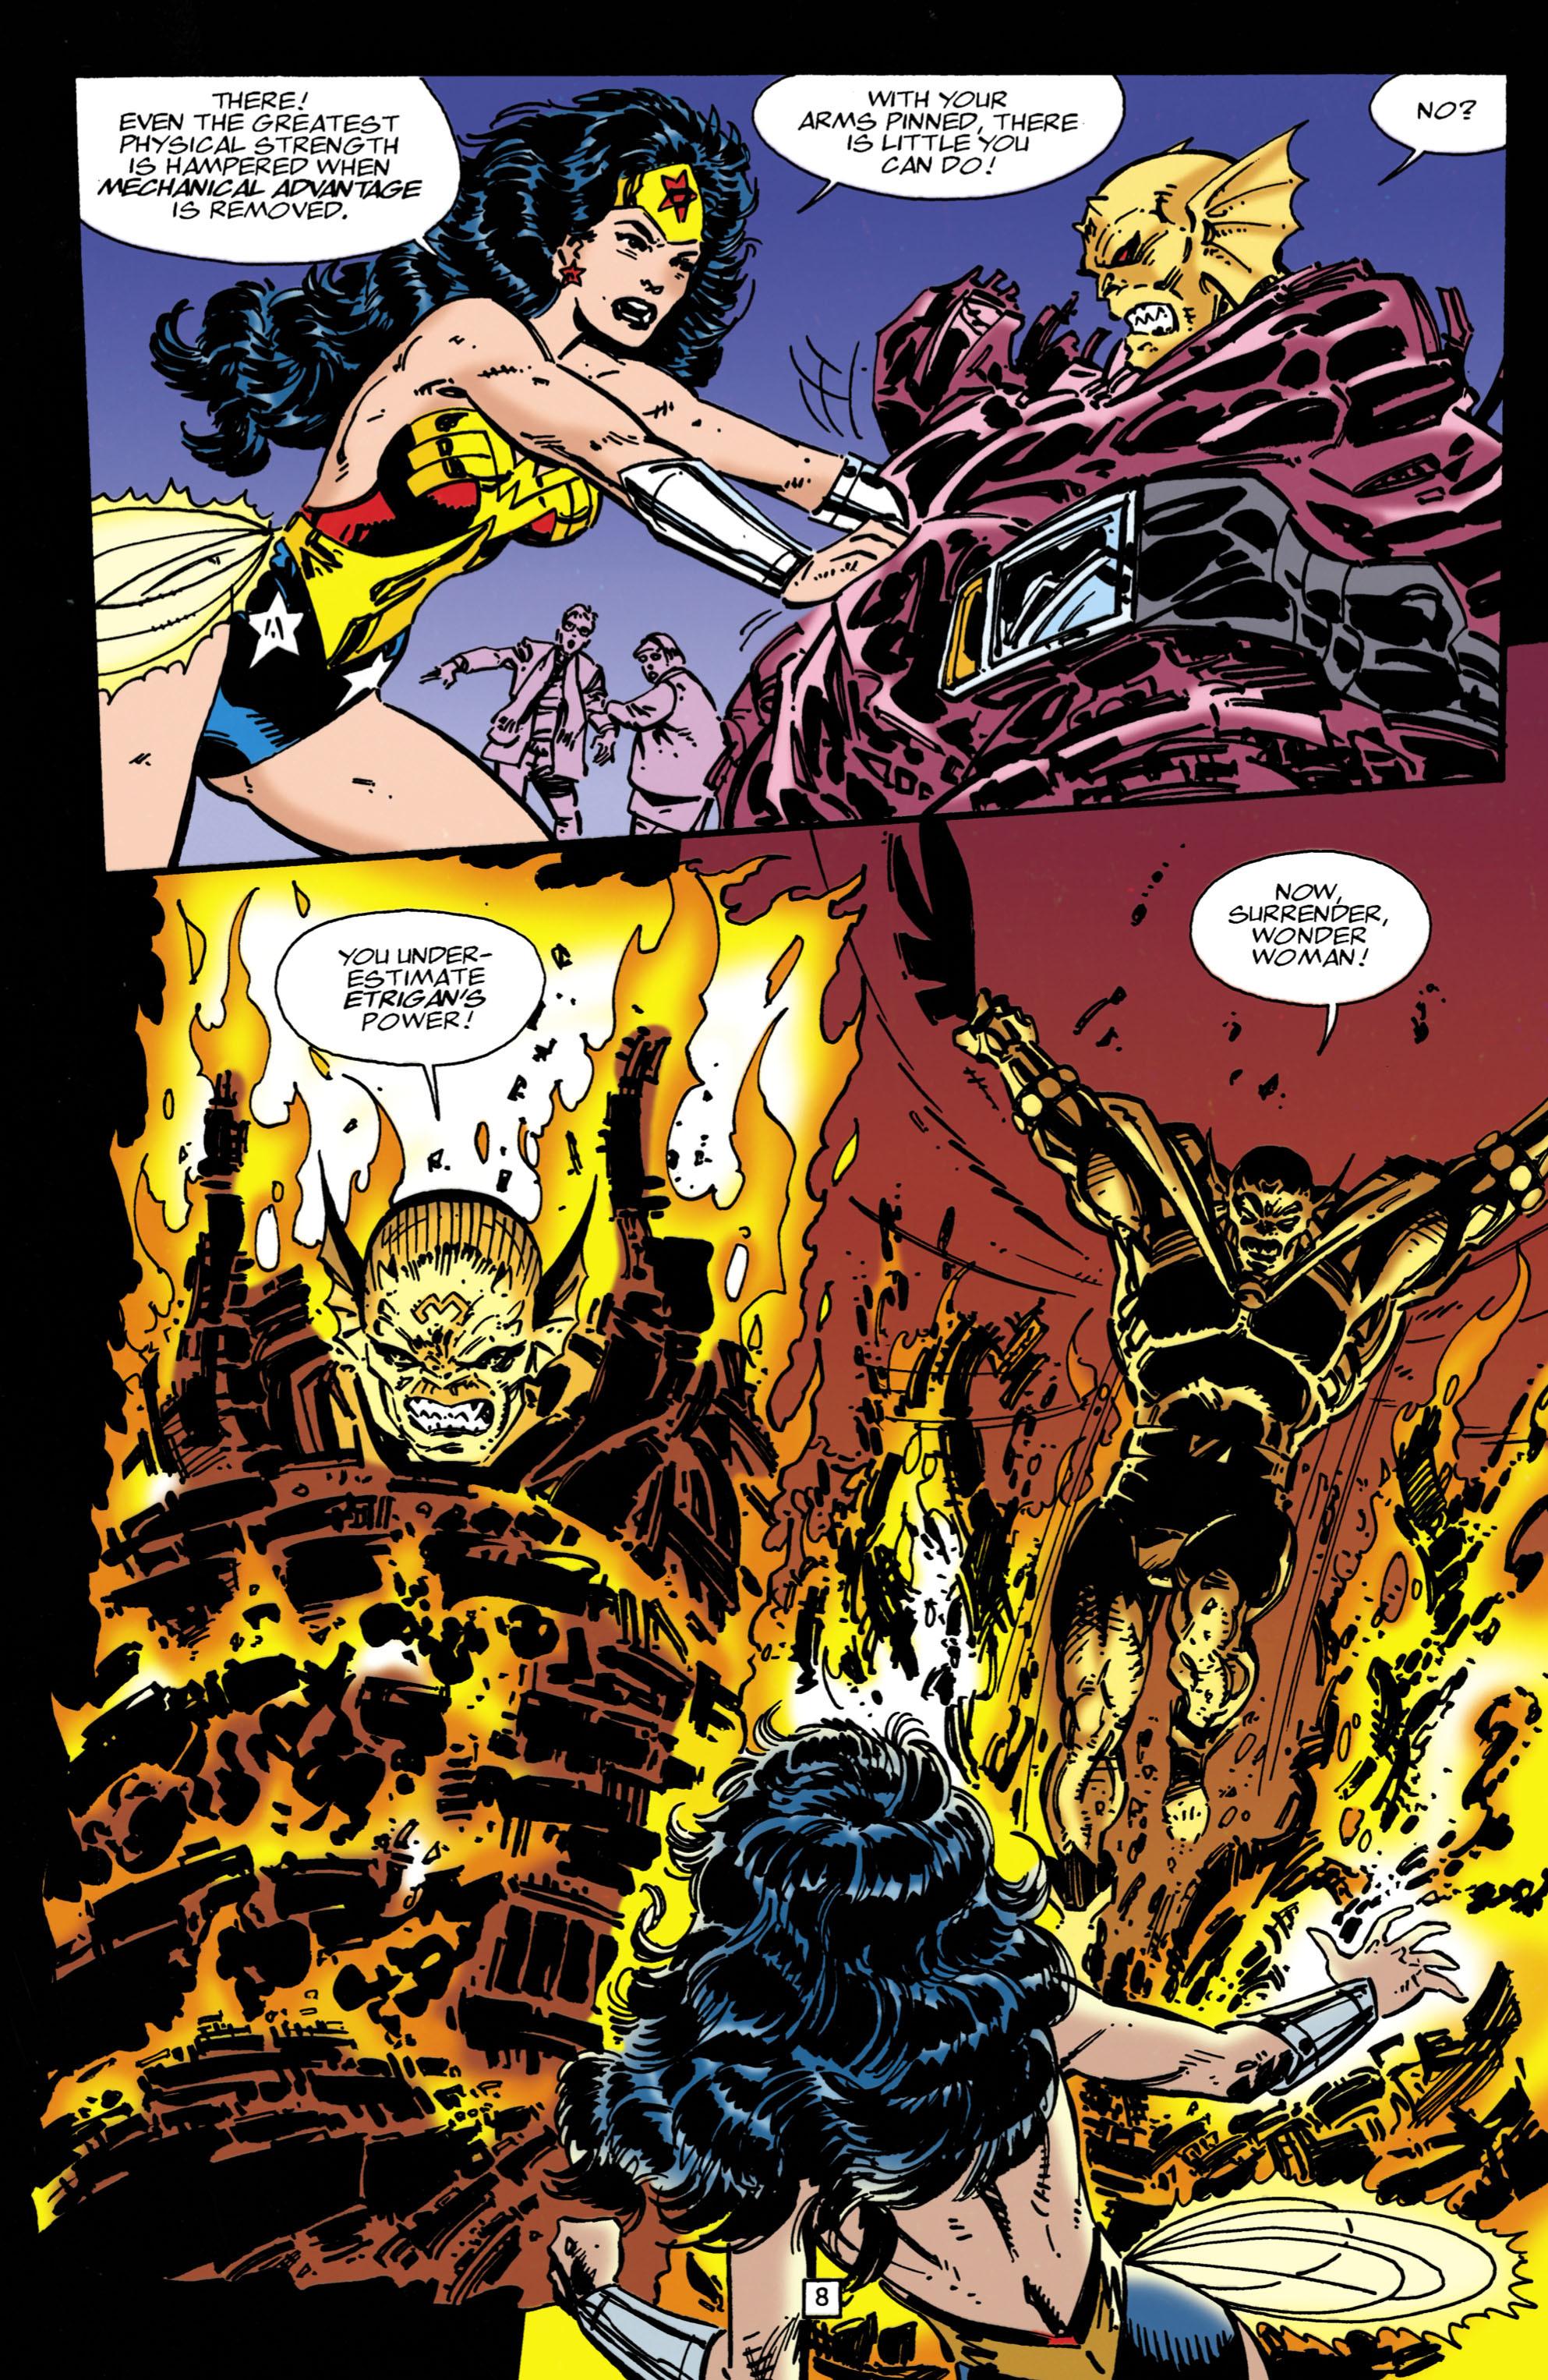 Read online Wonder Woman (1987) comic -  Issue #107 - 8